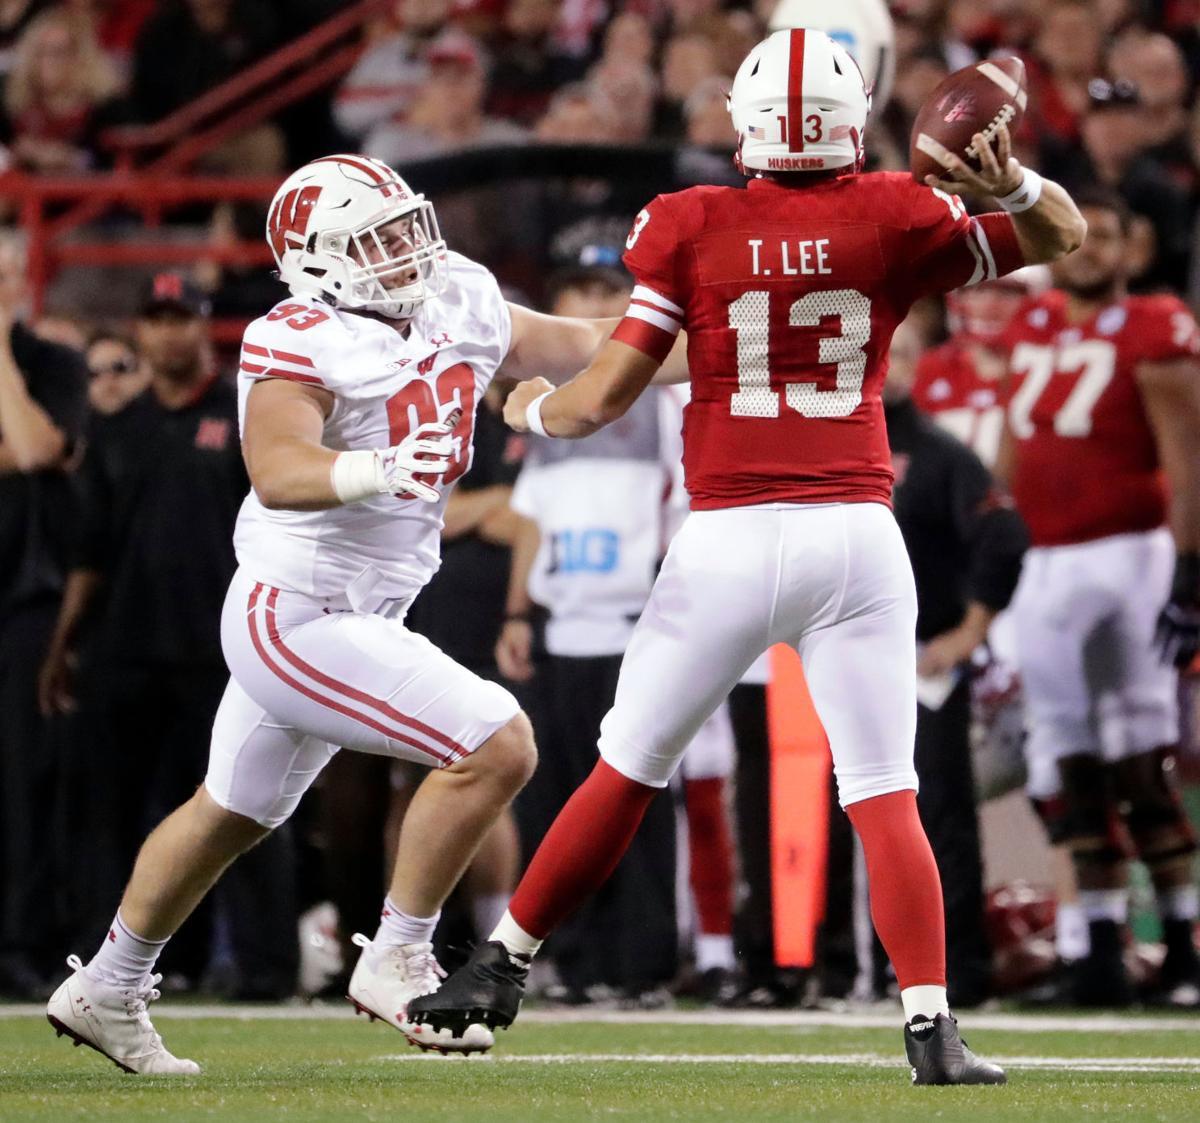 Garrett Rand pressures Nebraska QB Tanner Lee, State Journal photo